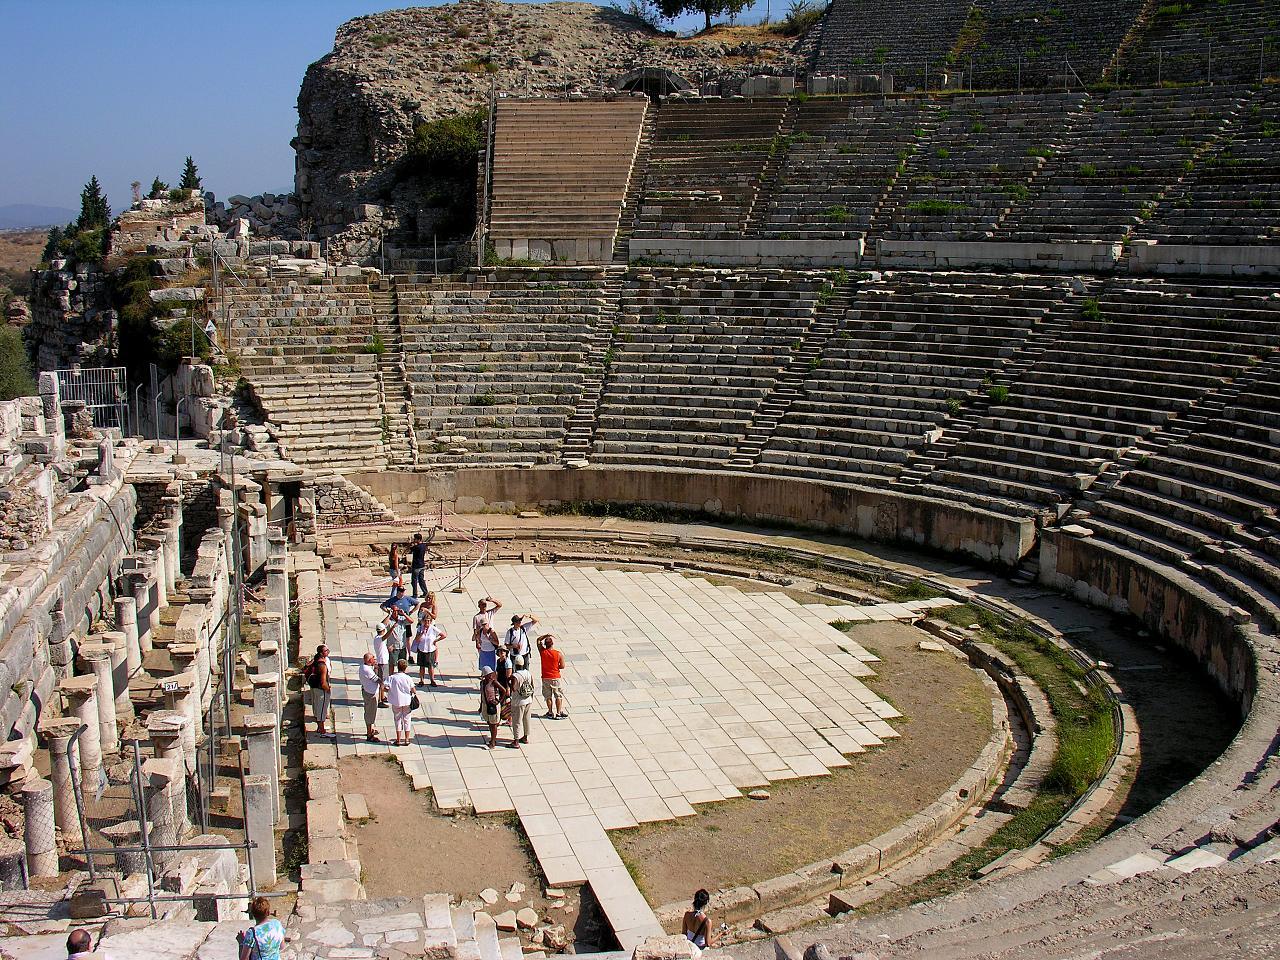 File:The Great Theatre in Ephesus, Turkey.jpg